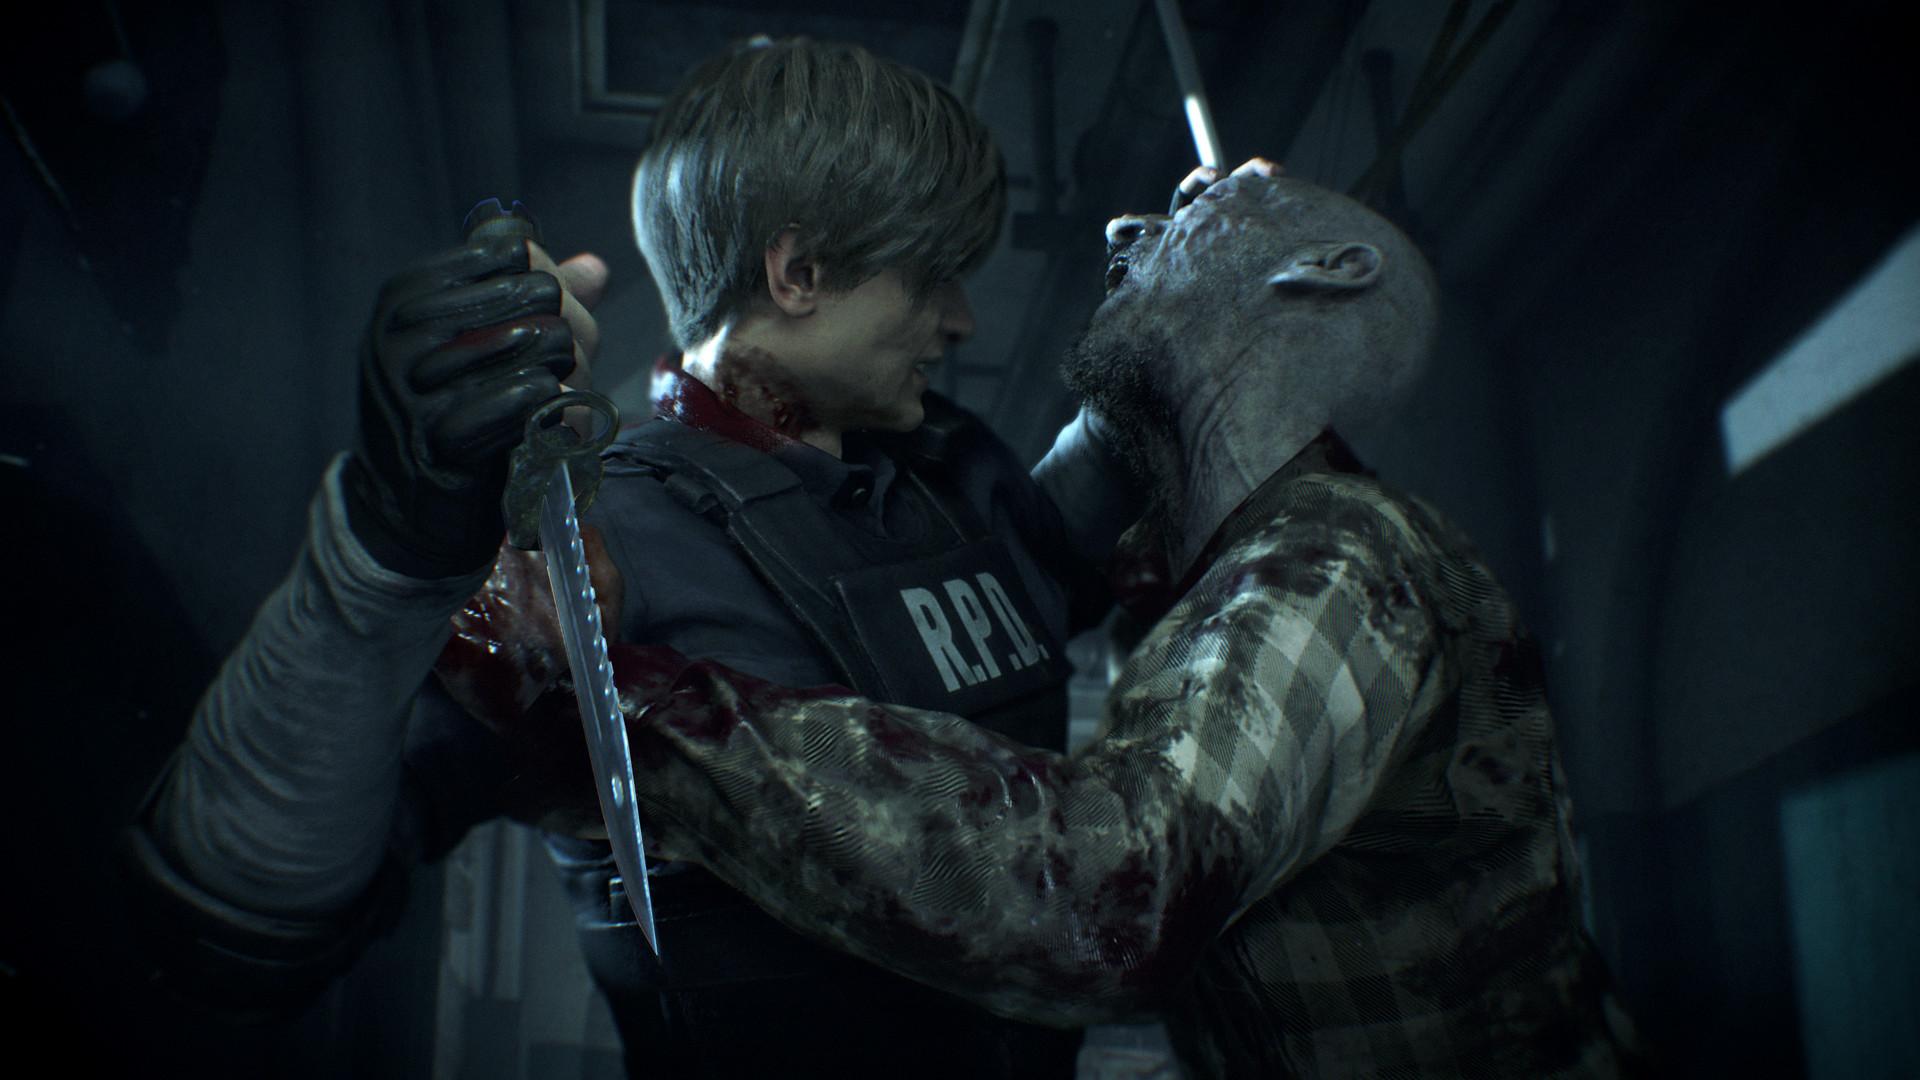 Resident Evil 2 - Best Action Games 2020